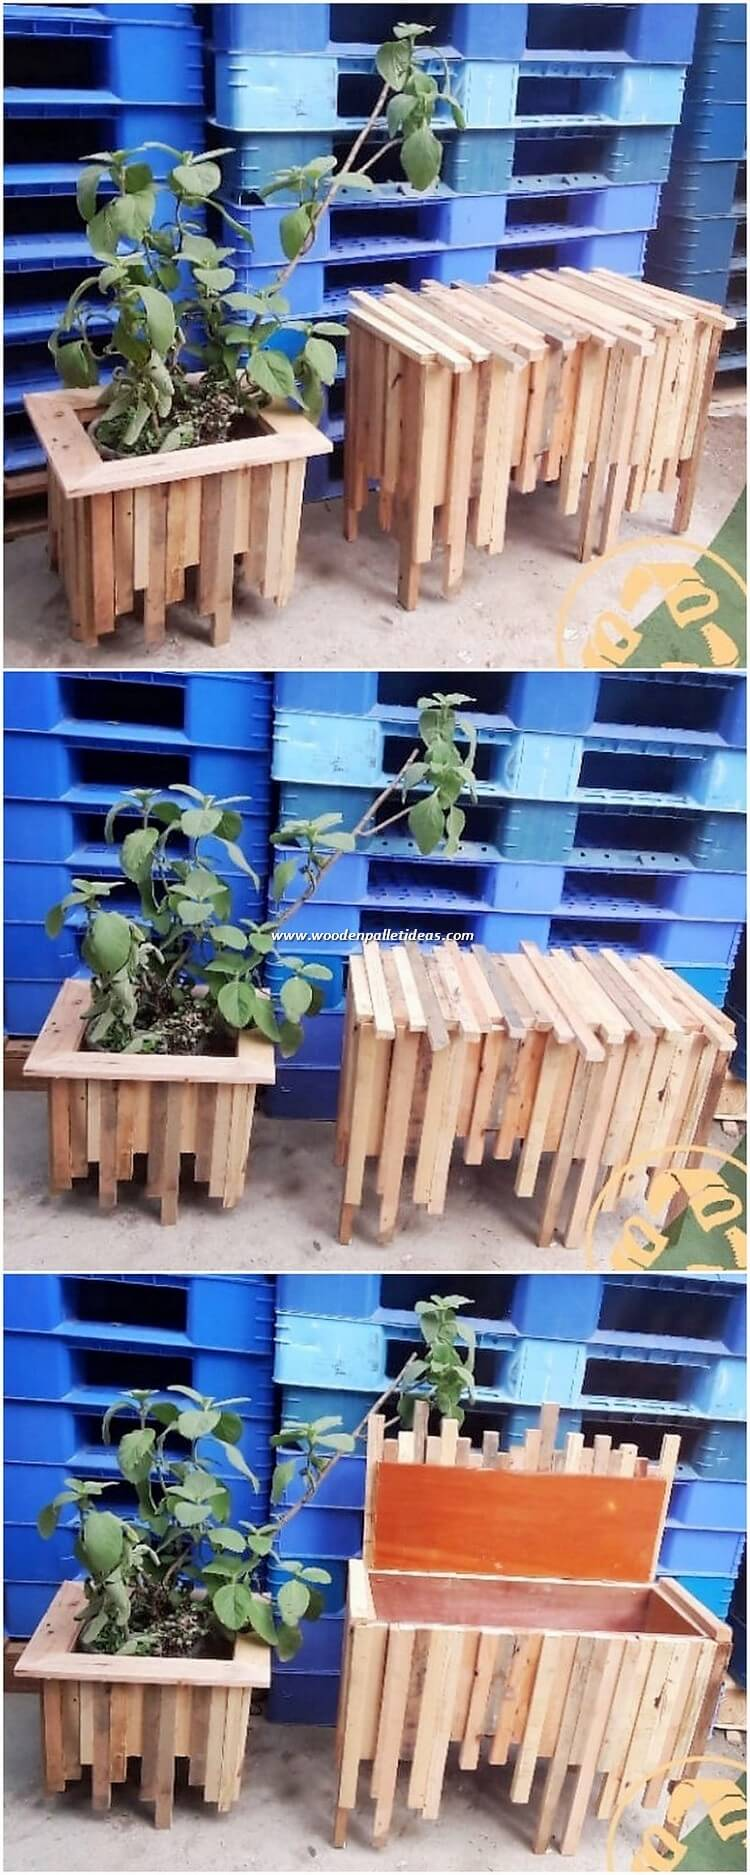 Pallet Planter and Storage Box